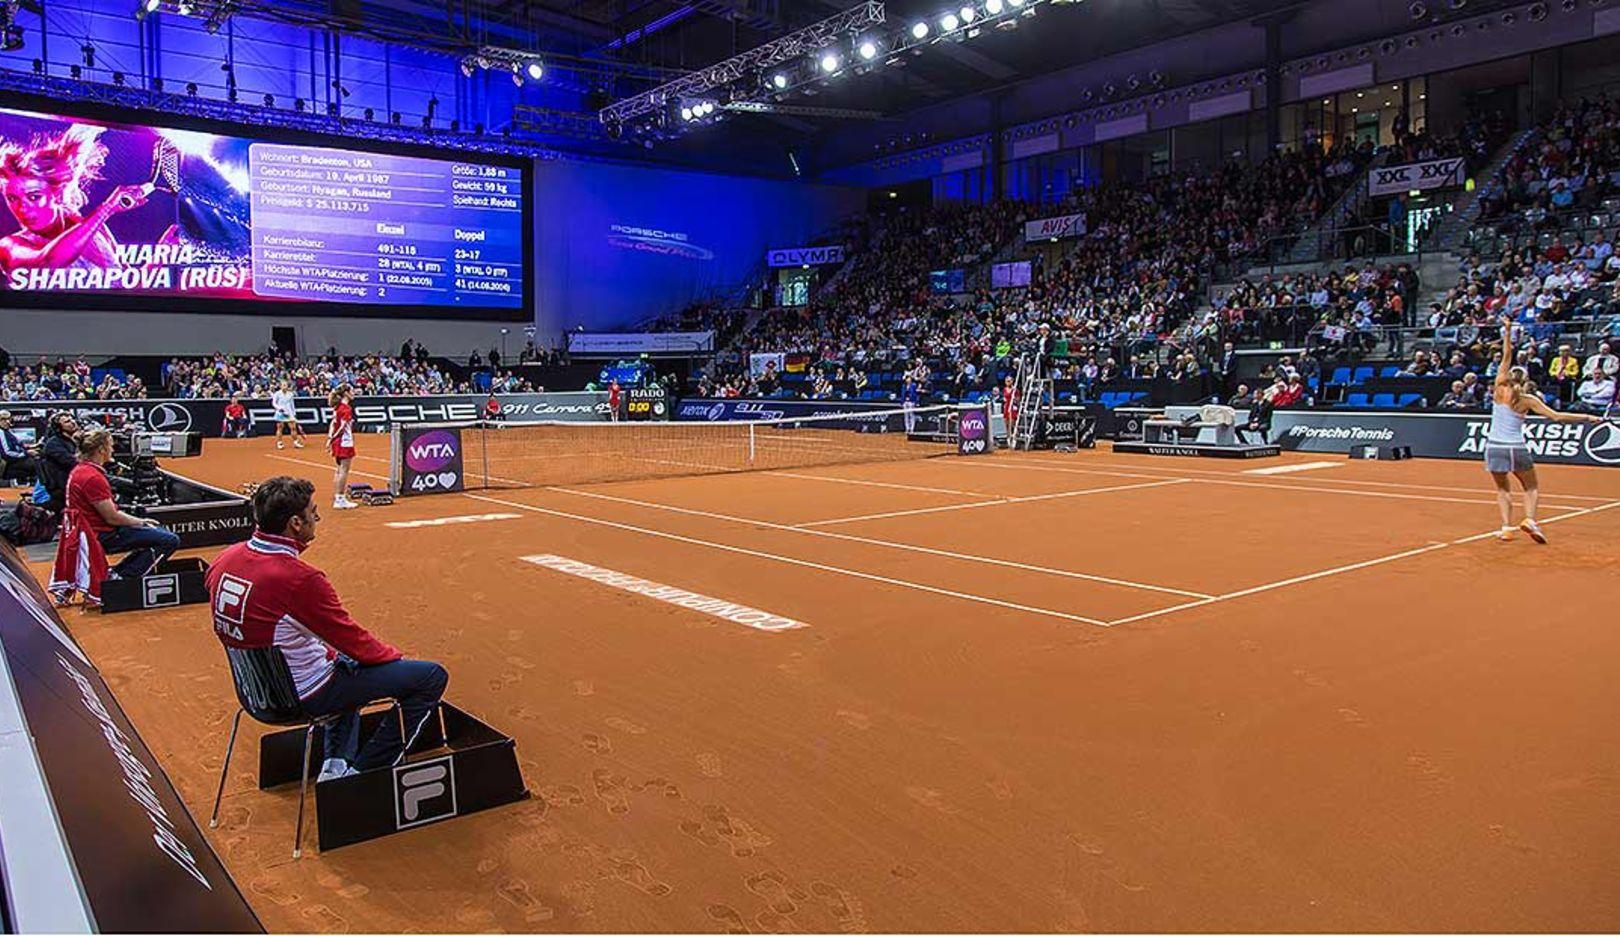 Tennisplatz, Porsche Tennis Grand Prix, Porsche-Arena Stuttgart, 2014, Porsche AG